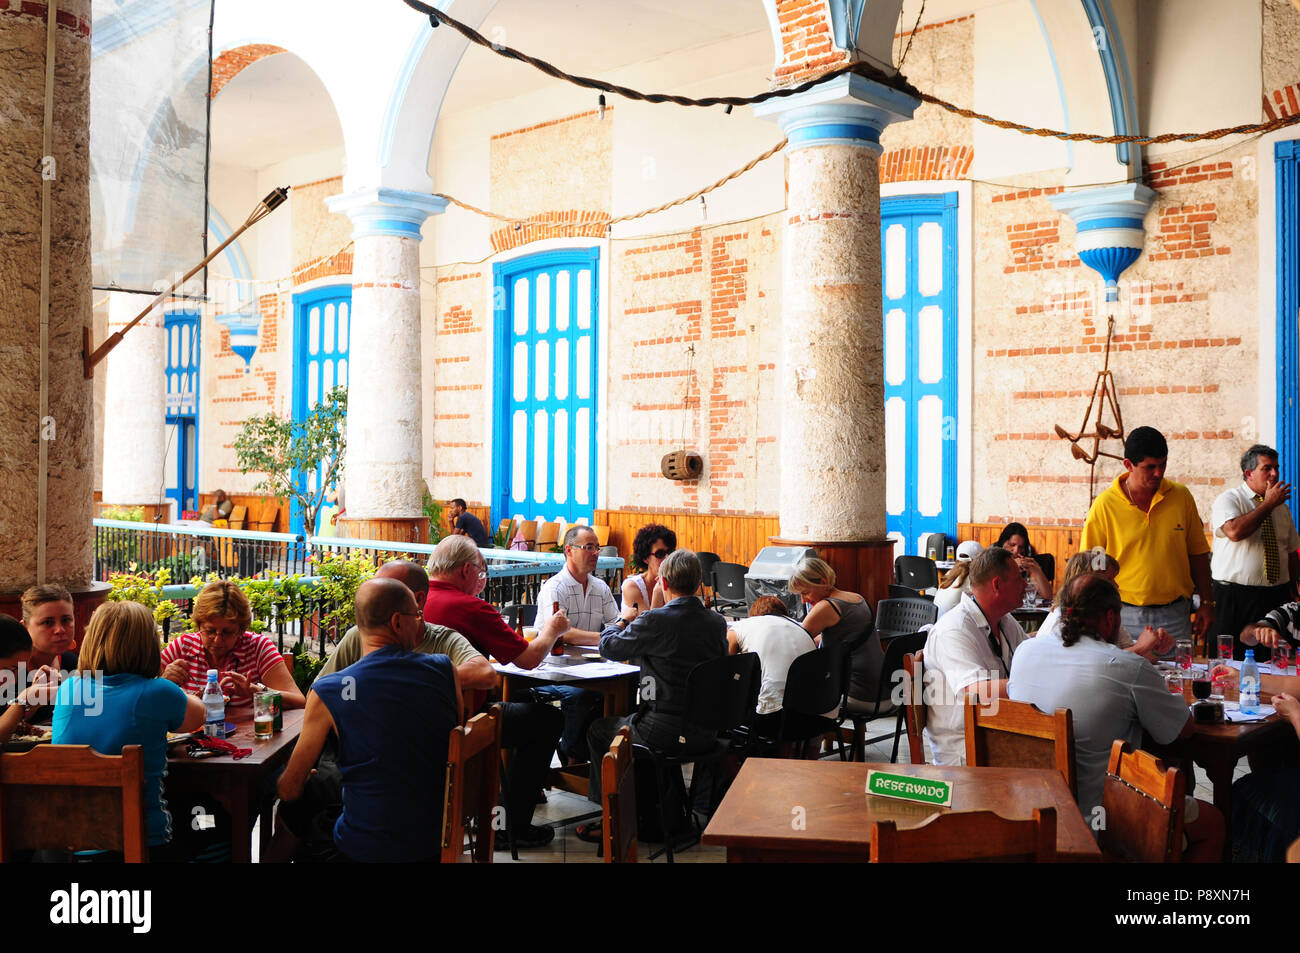 "Cuba: Restaurant at the ""Casa de la Musica"" in Havanna-City - a former castro residenz Stock Photo"